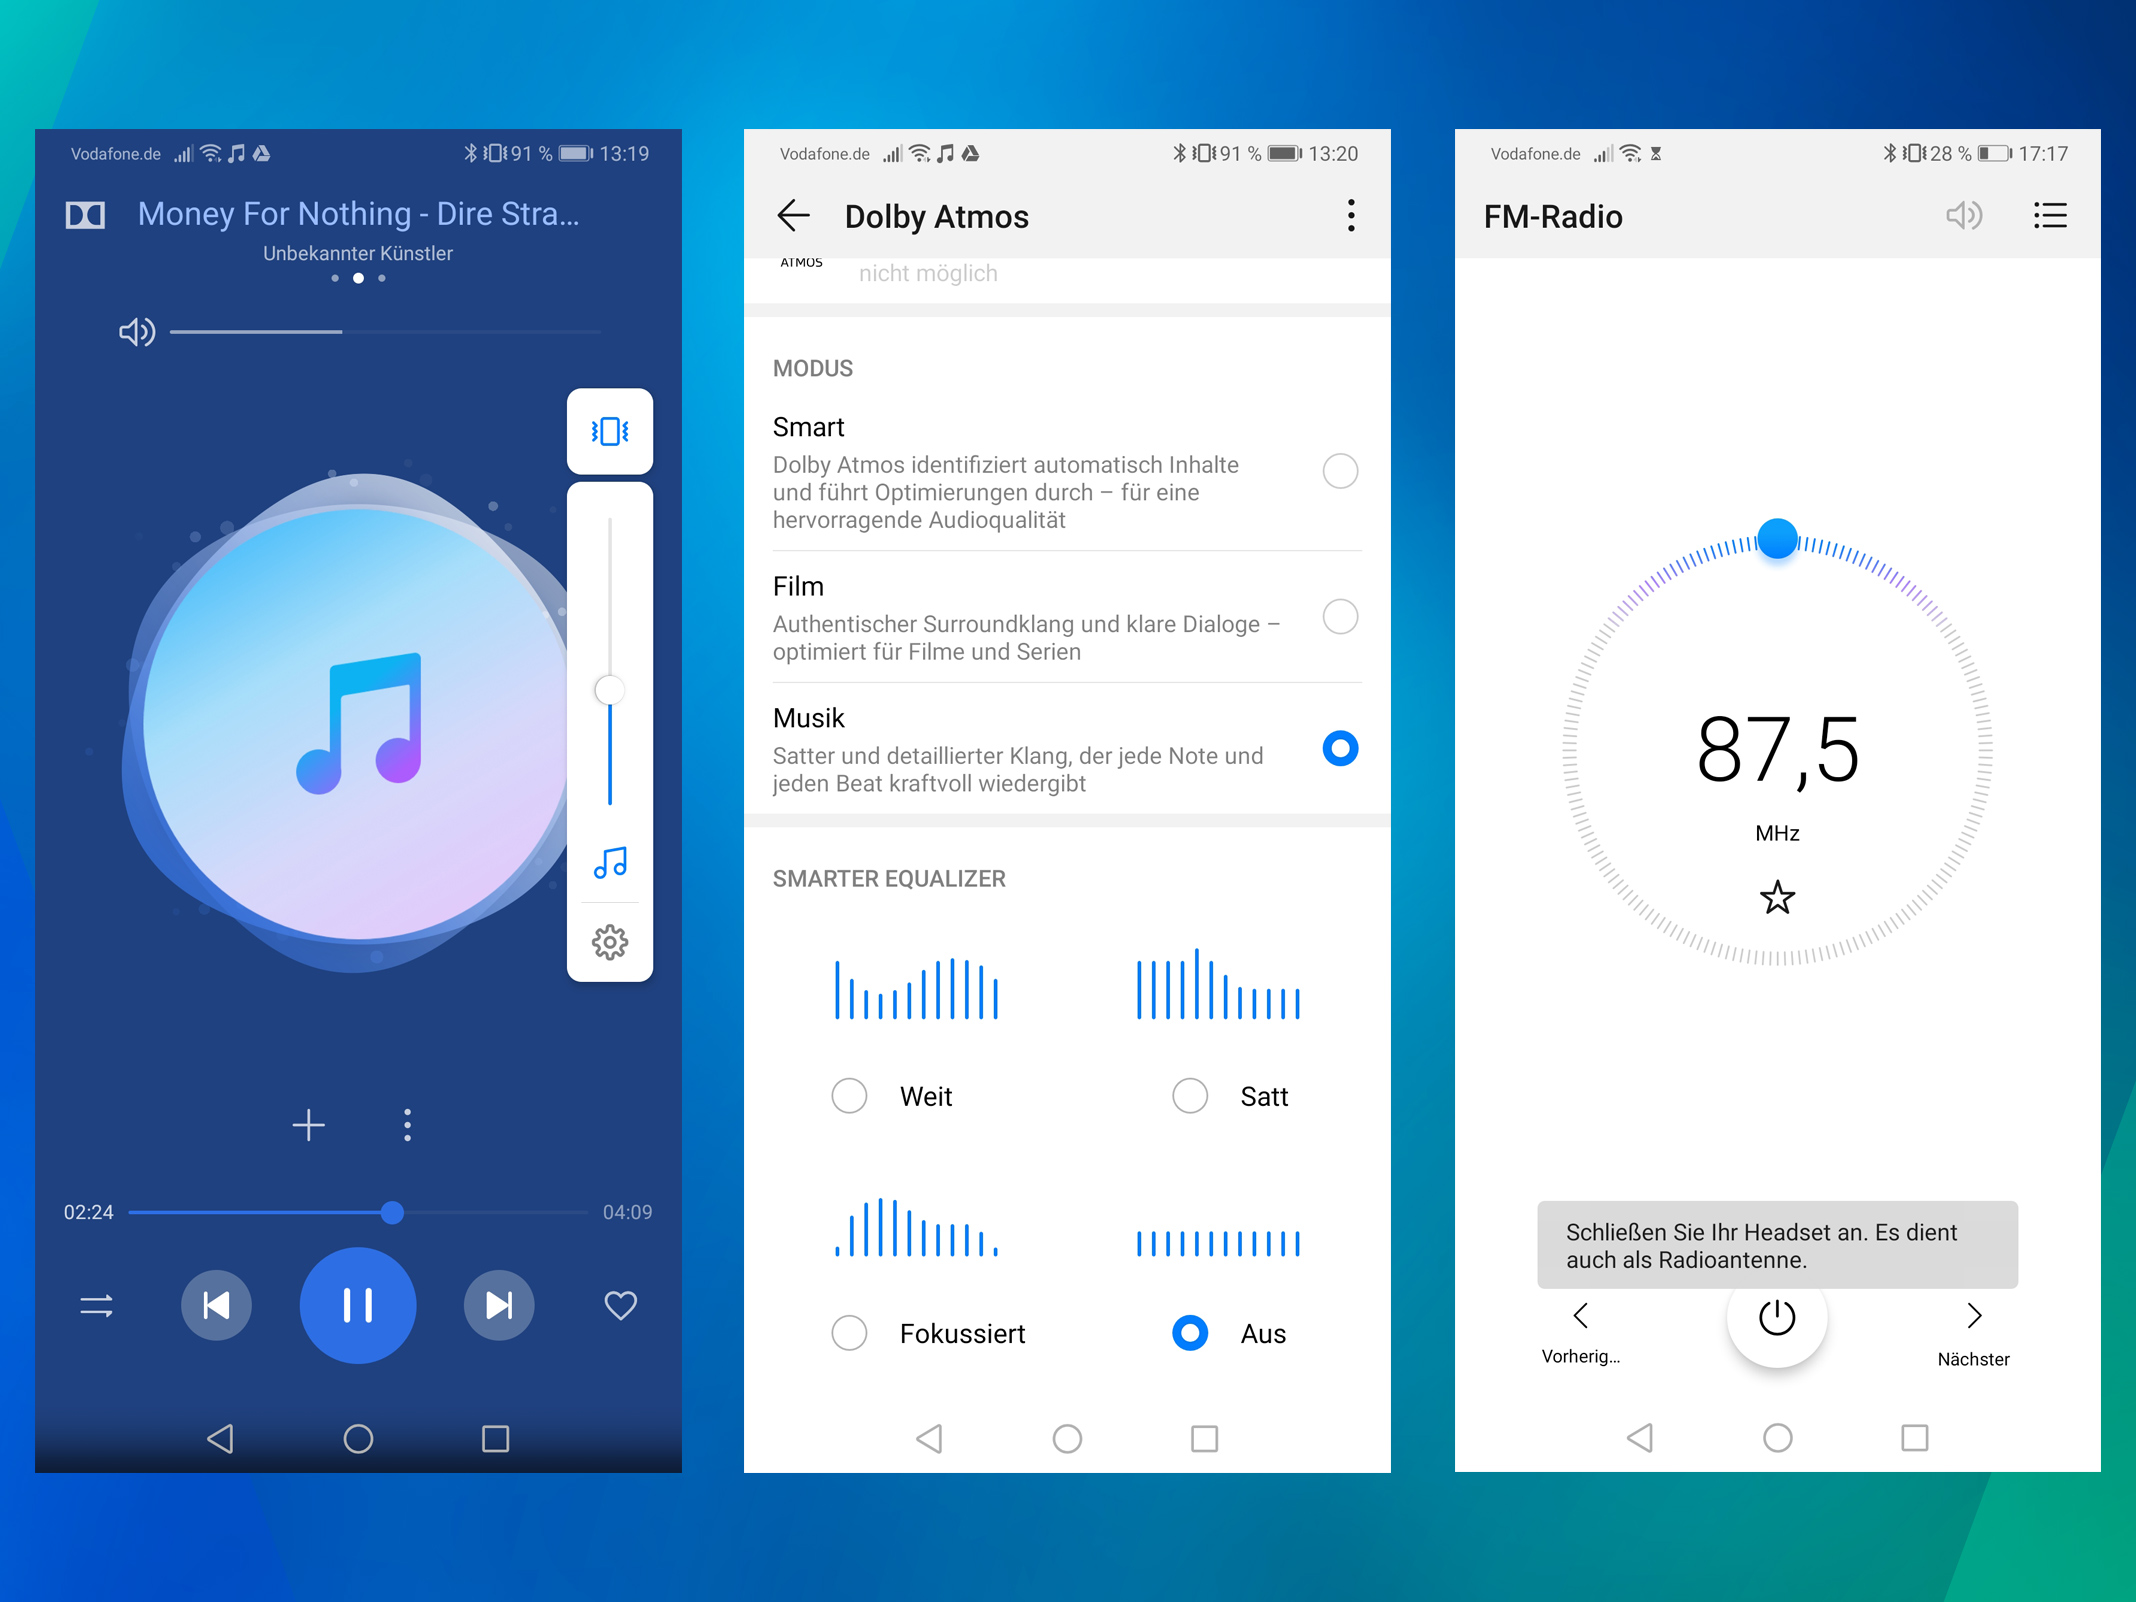 Huawei Mate 20: Audio, Sound und UKW-Radio